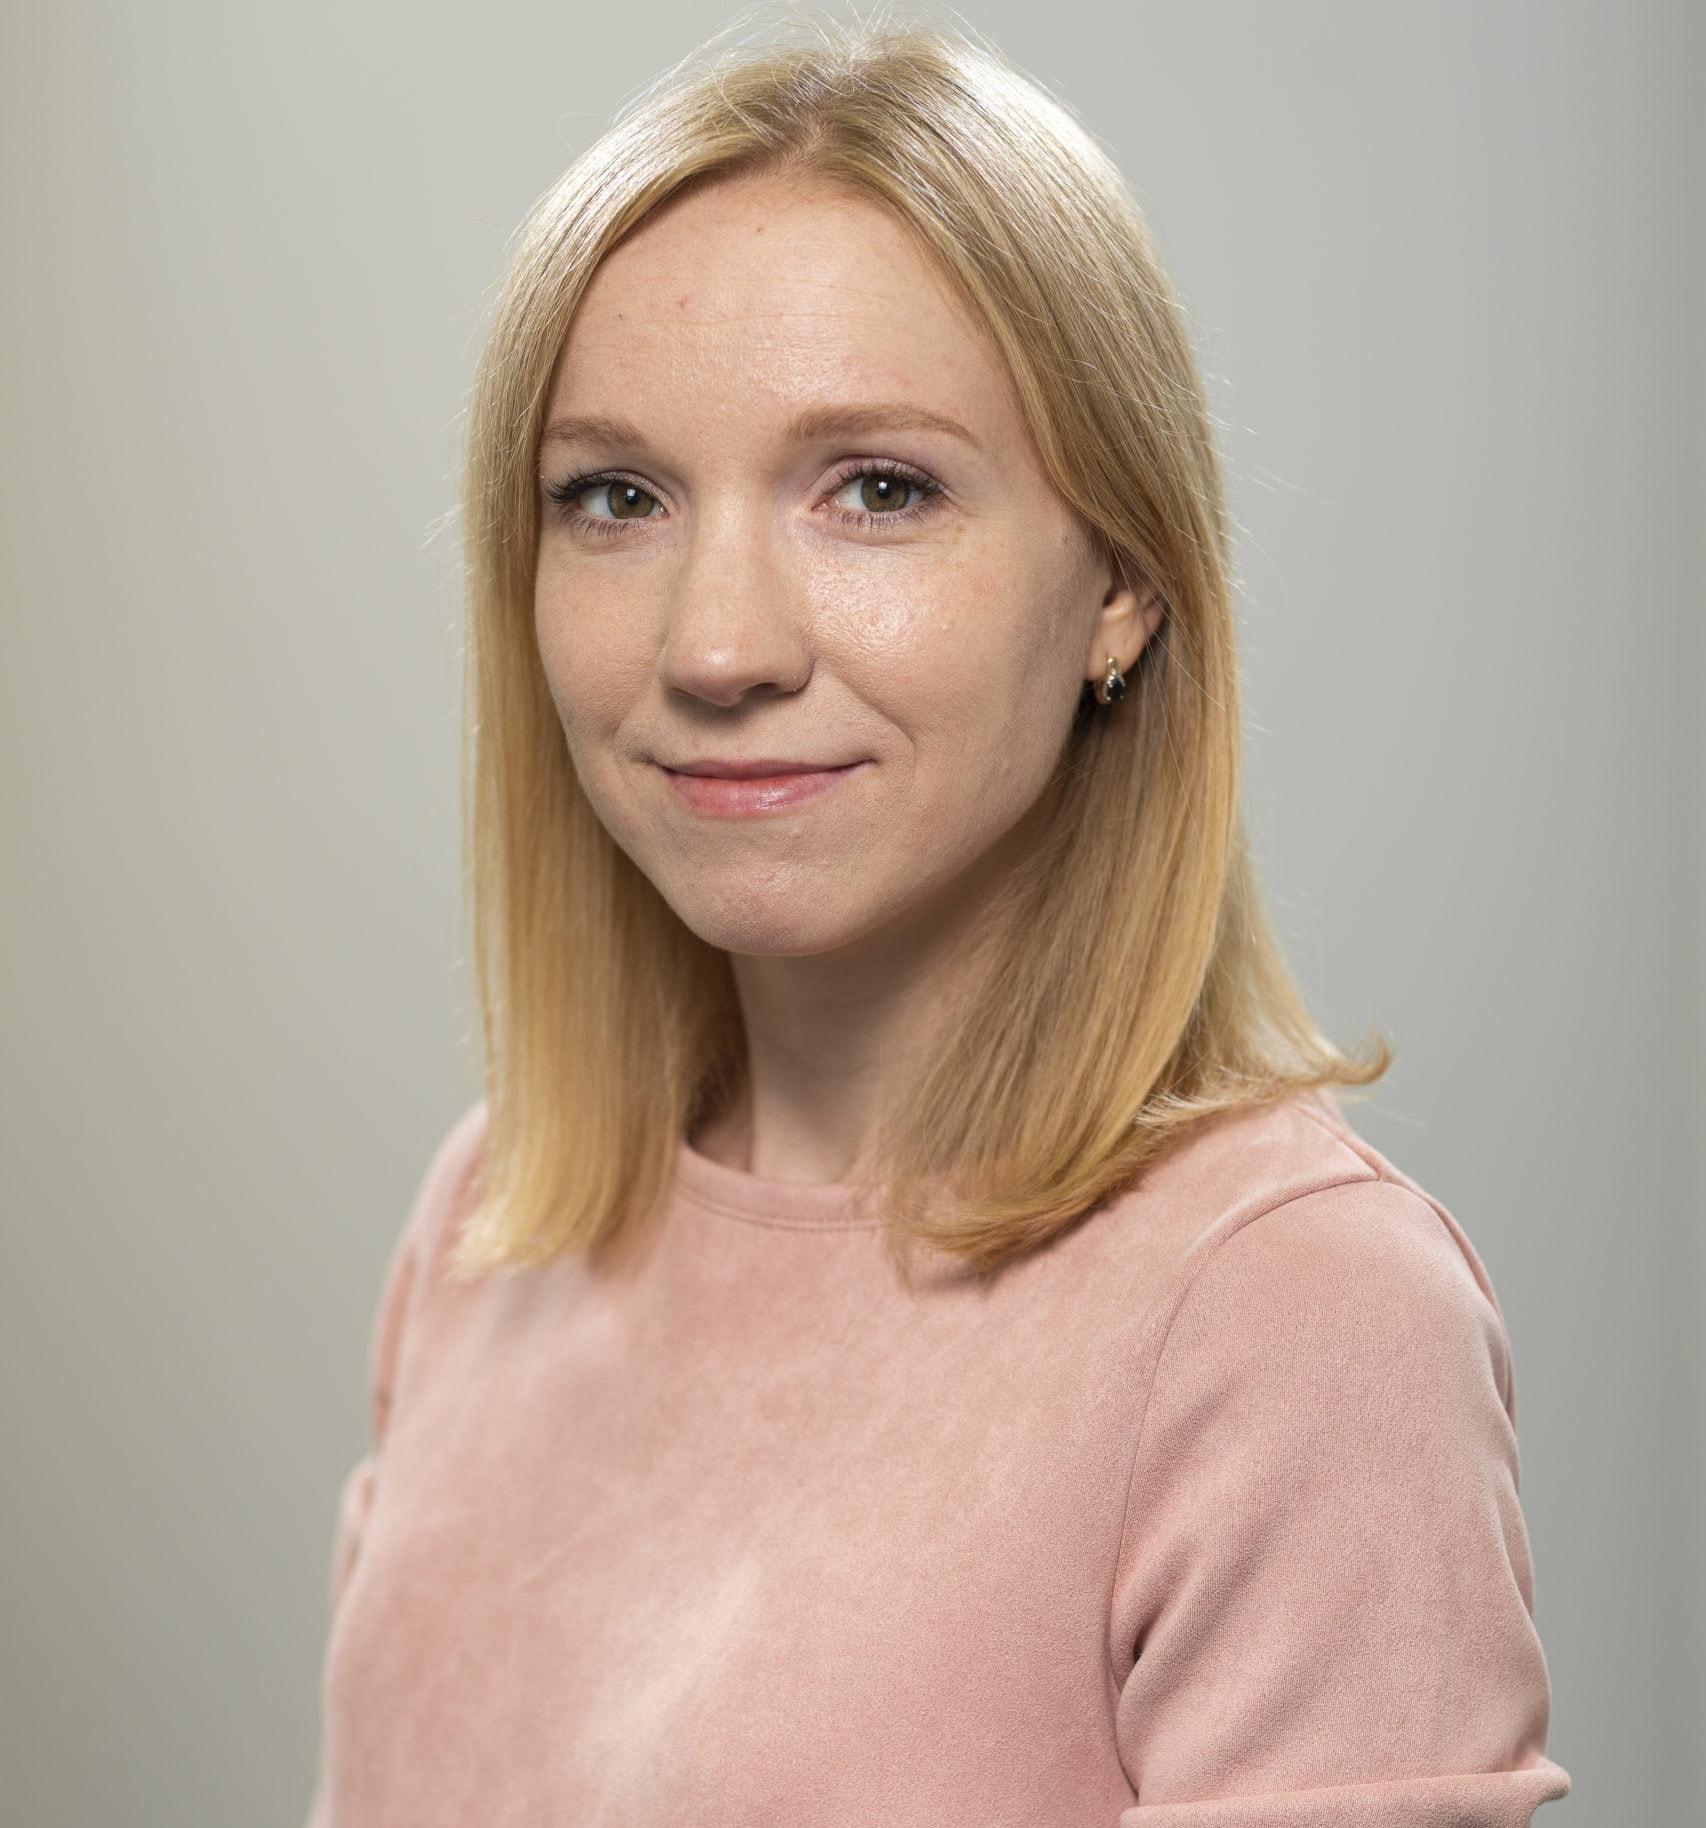 Maryna Gurevych